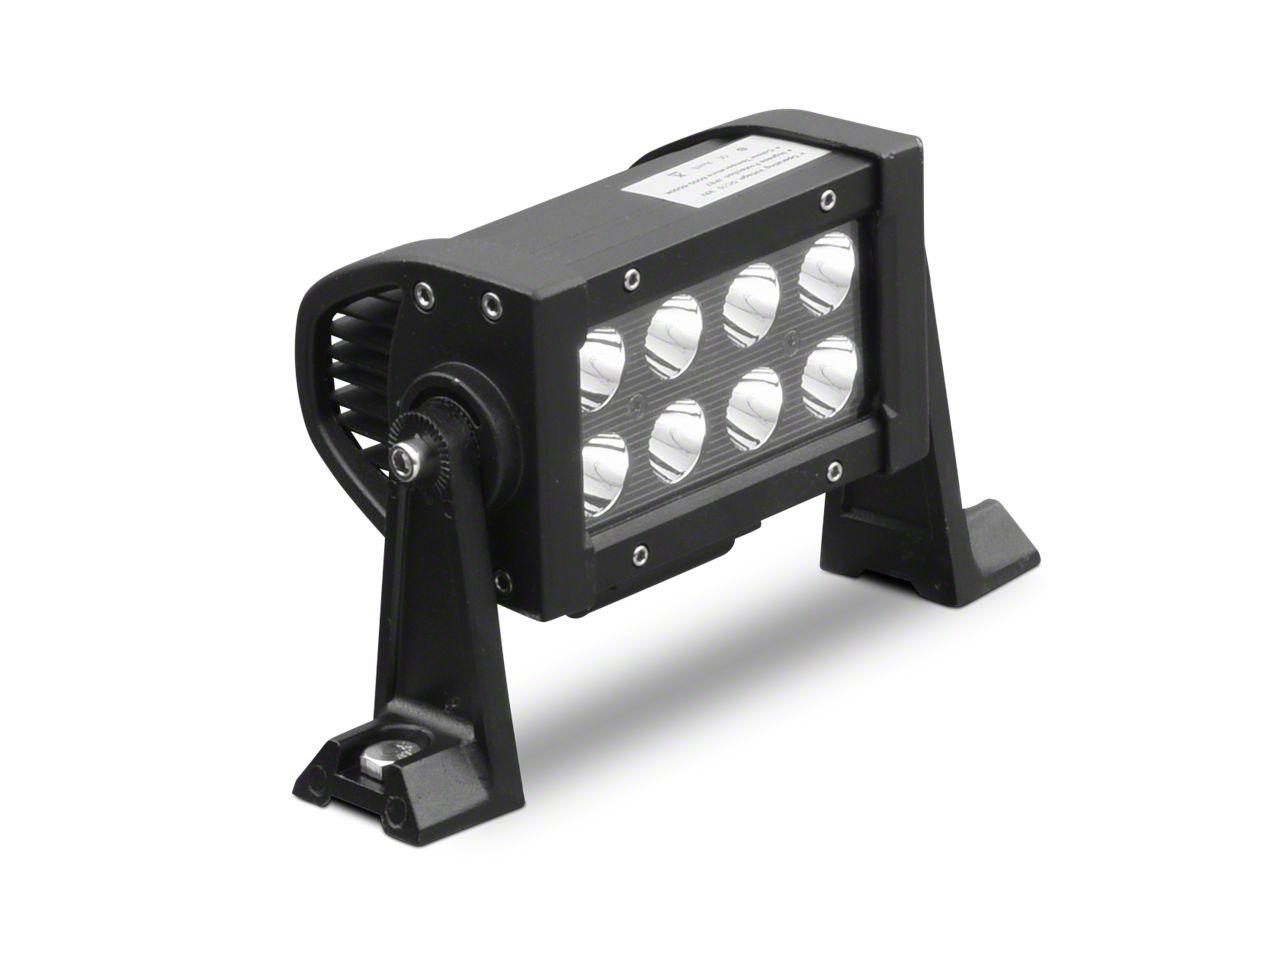 DV8 Off-Road 5 in. BRS Pro Series LED Light Bar - Spot Beam